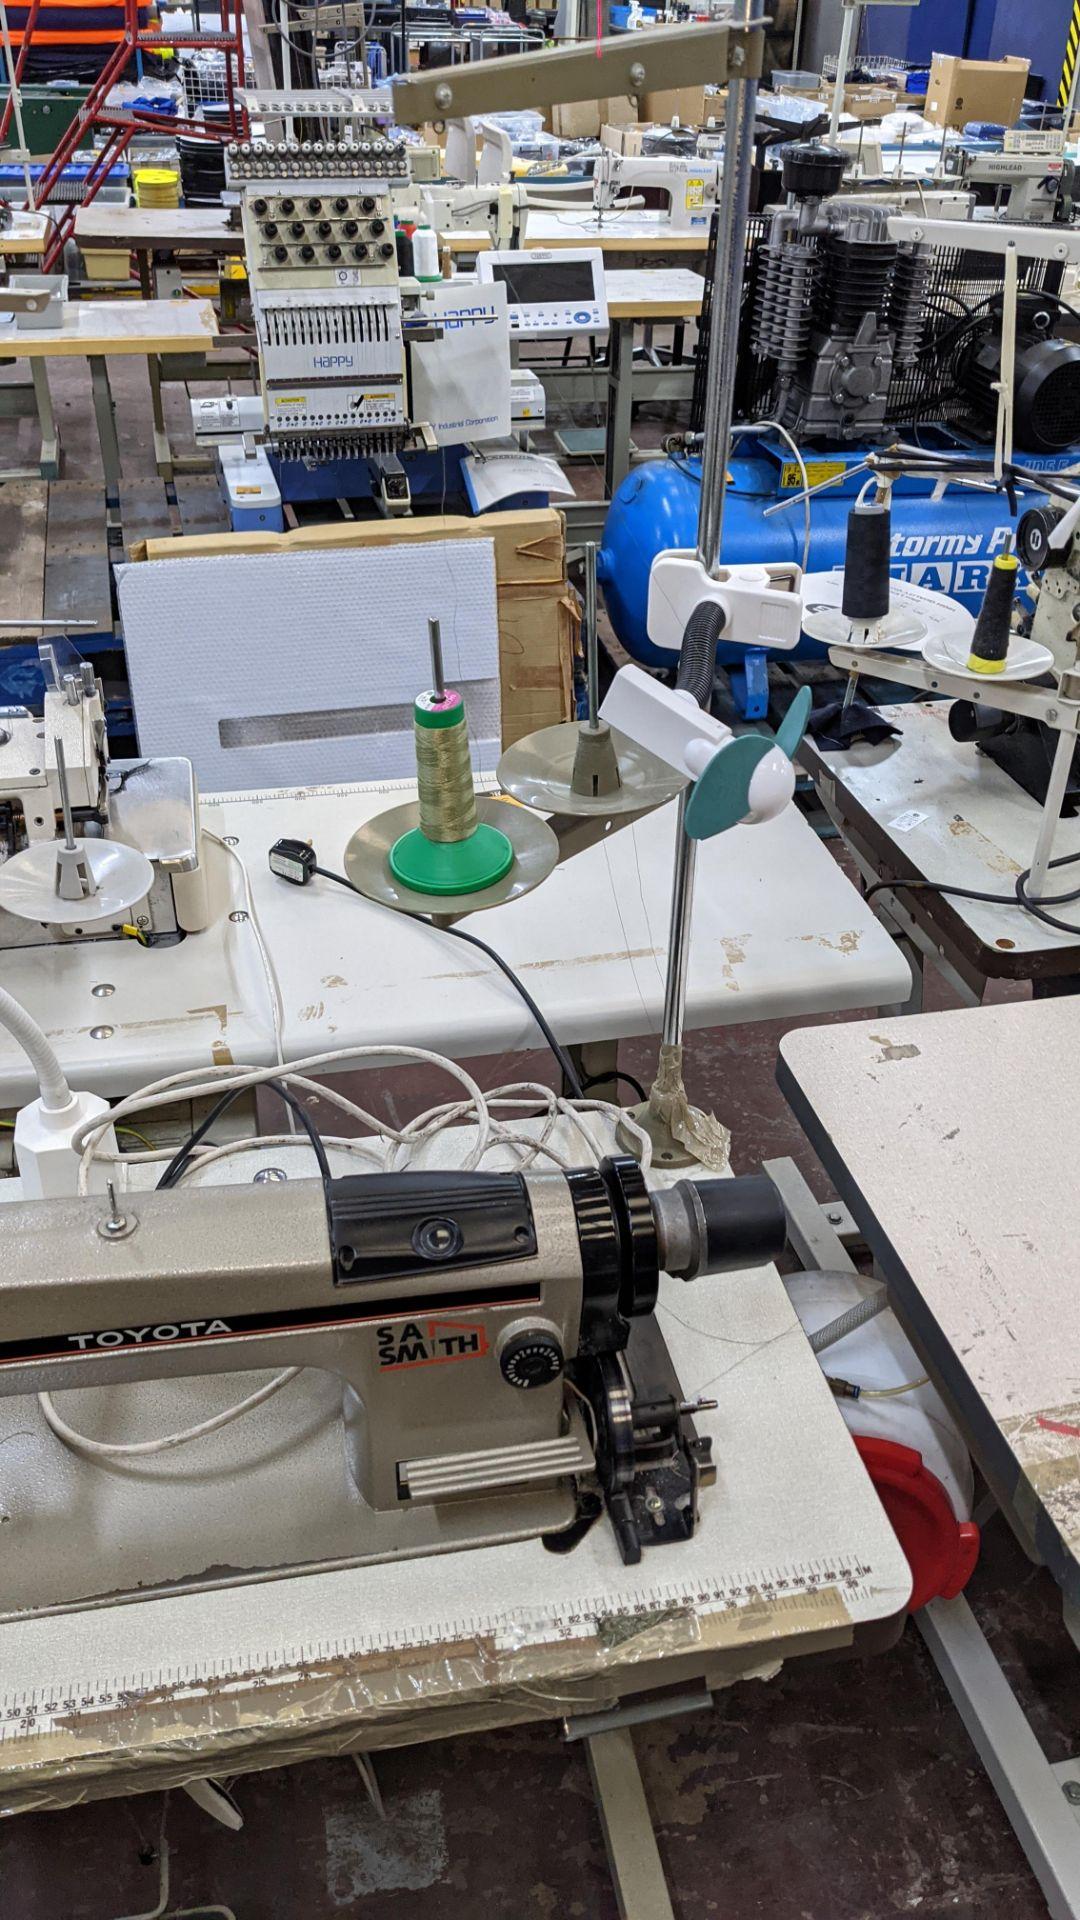 Toyota sewing machine - Image 16 of 17